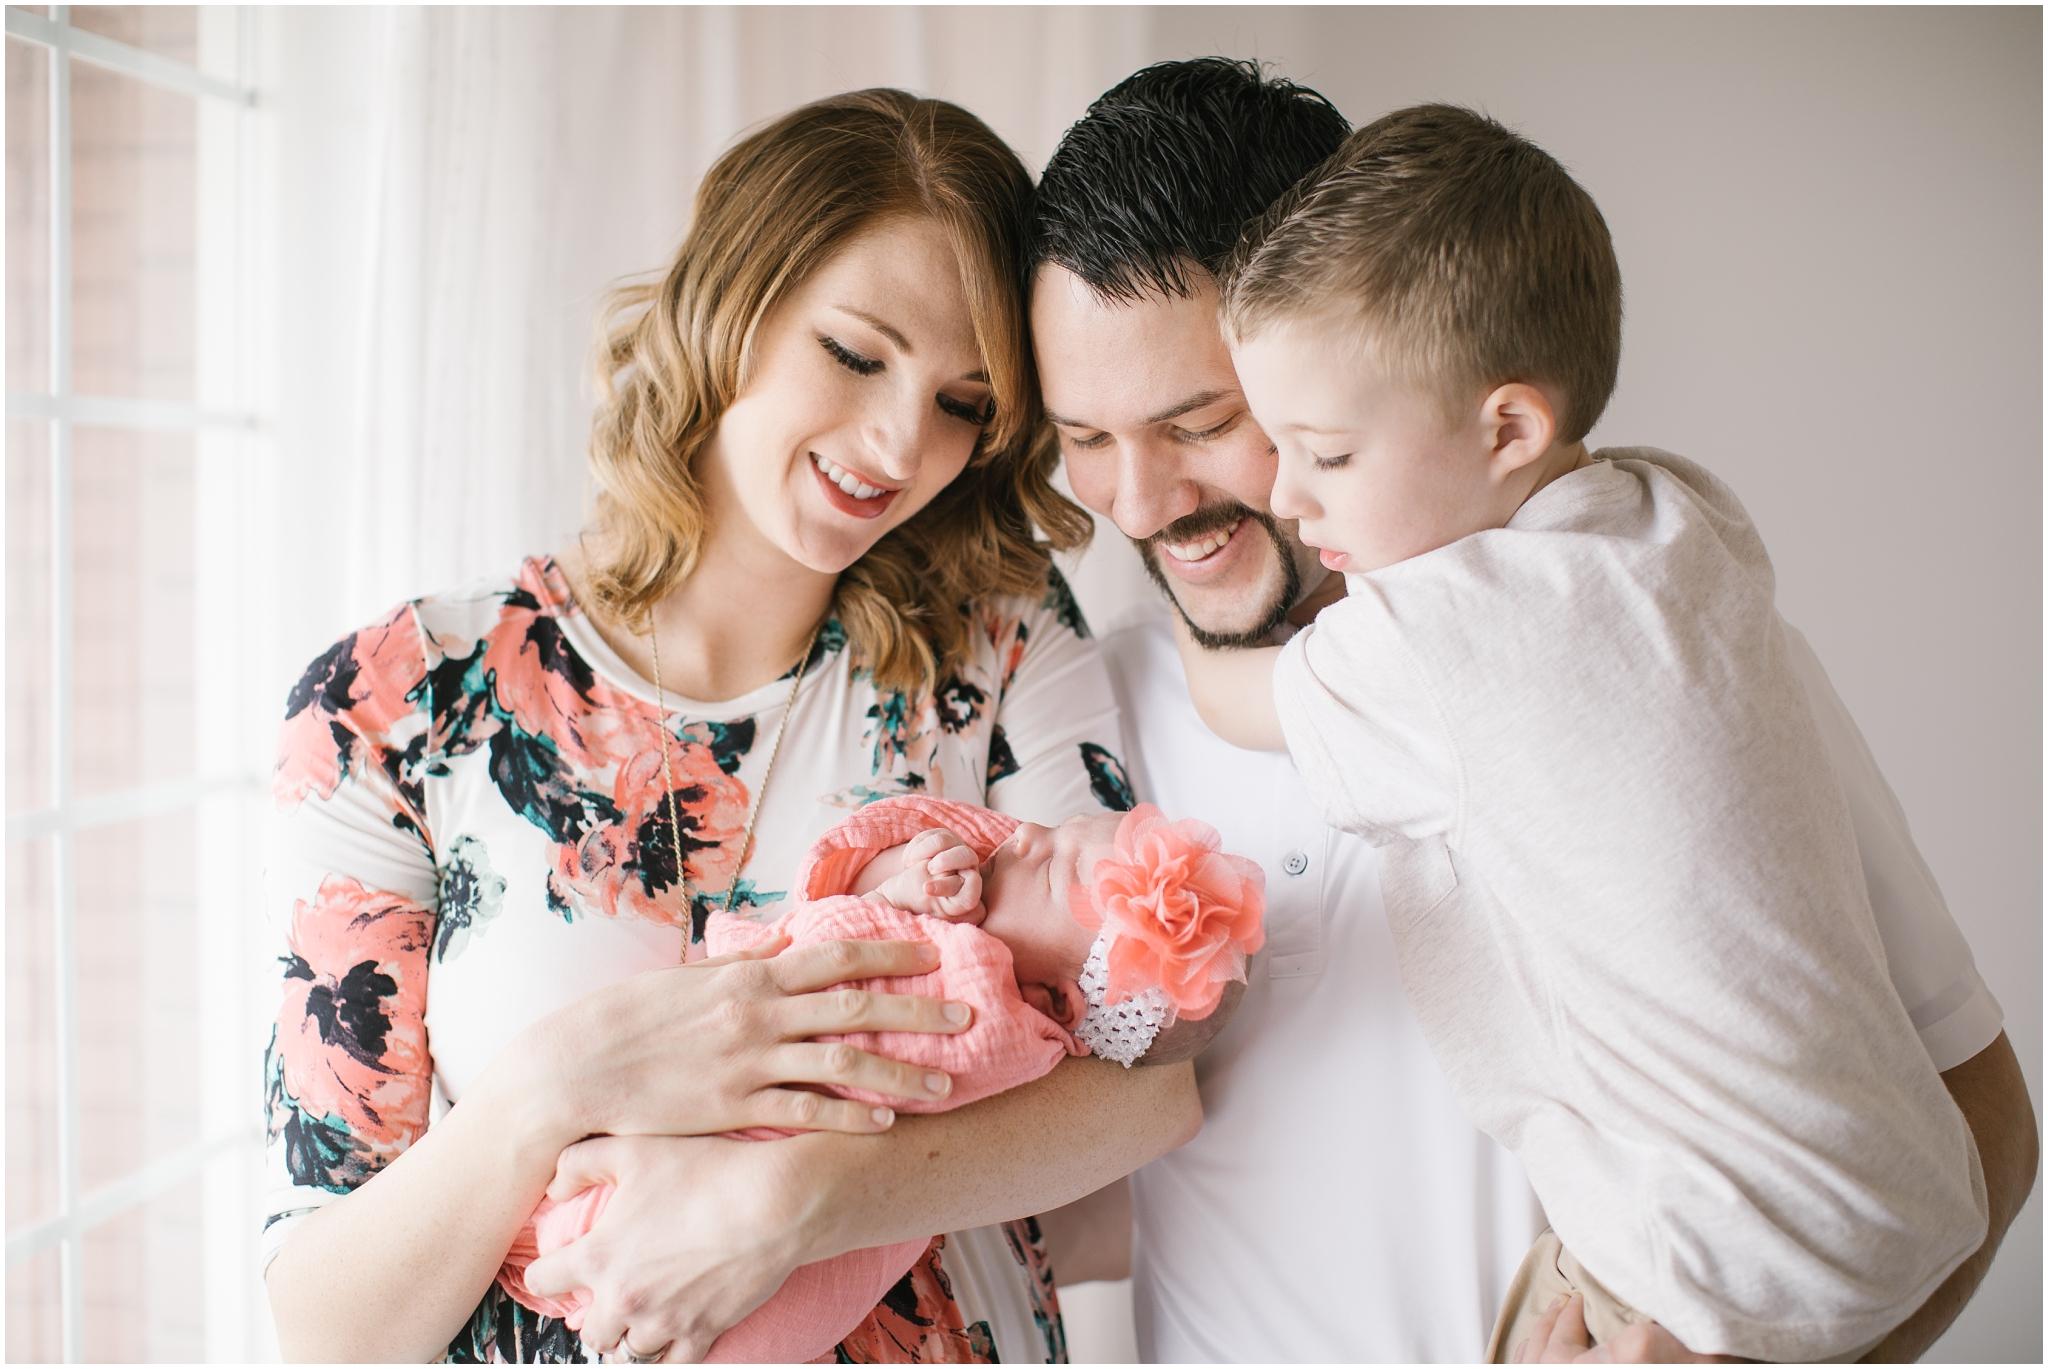 Autumn-1_Lizzie-B-Imagery-Utah-Family-Photographer-Central-Utah-Photographer-Utah-County-Newborn.jpg